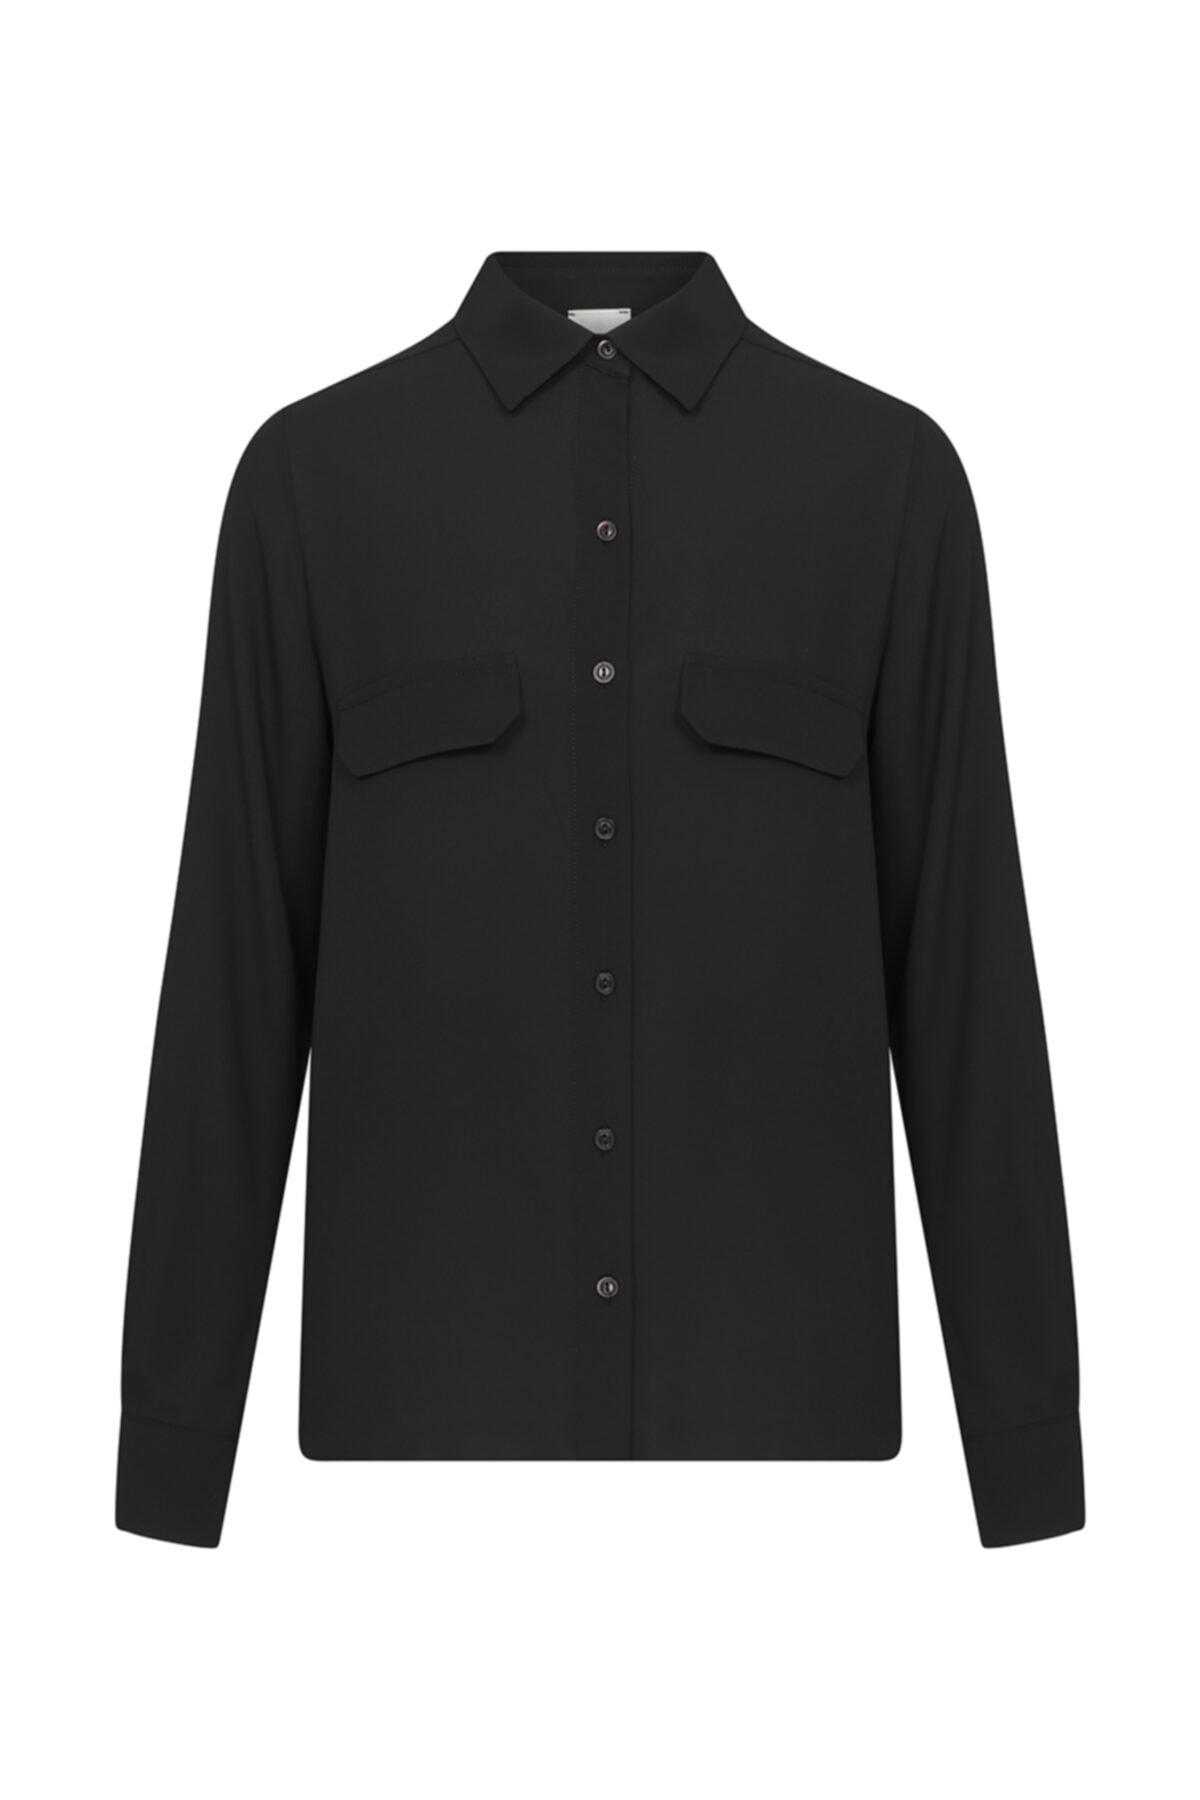 W Collection Kadın Siyah Cep Detaylı Gömlek 1